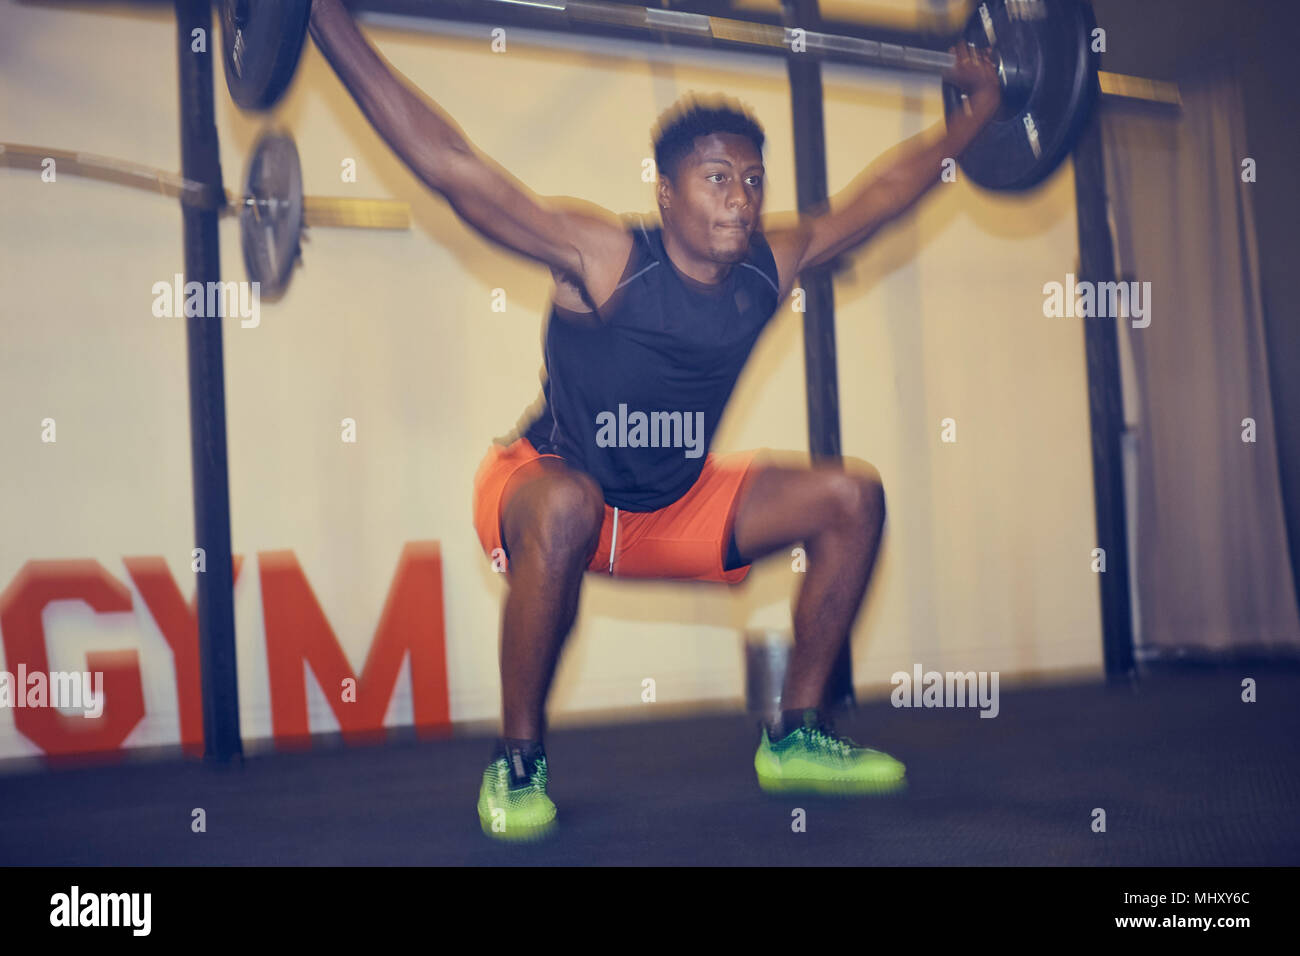 Man in gym weightlifting using barbell, defocused - Stock Image